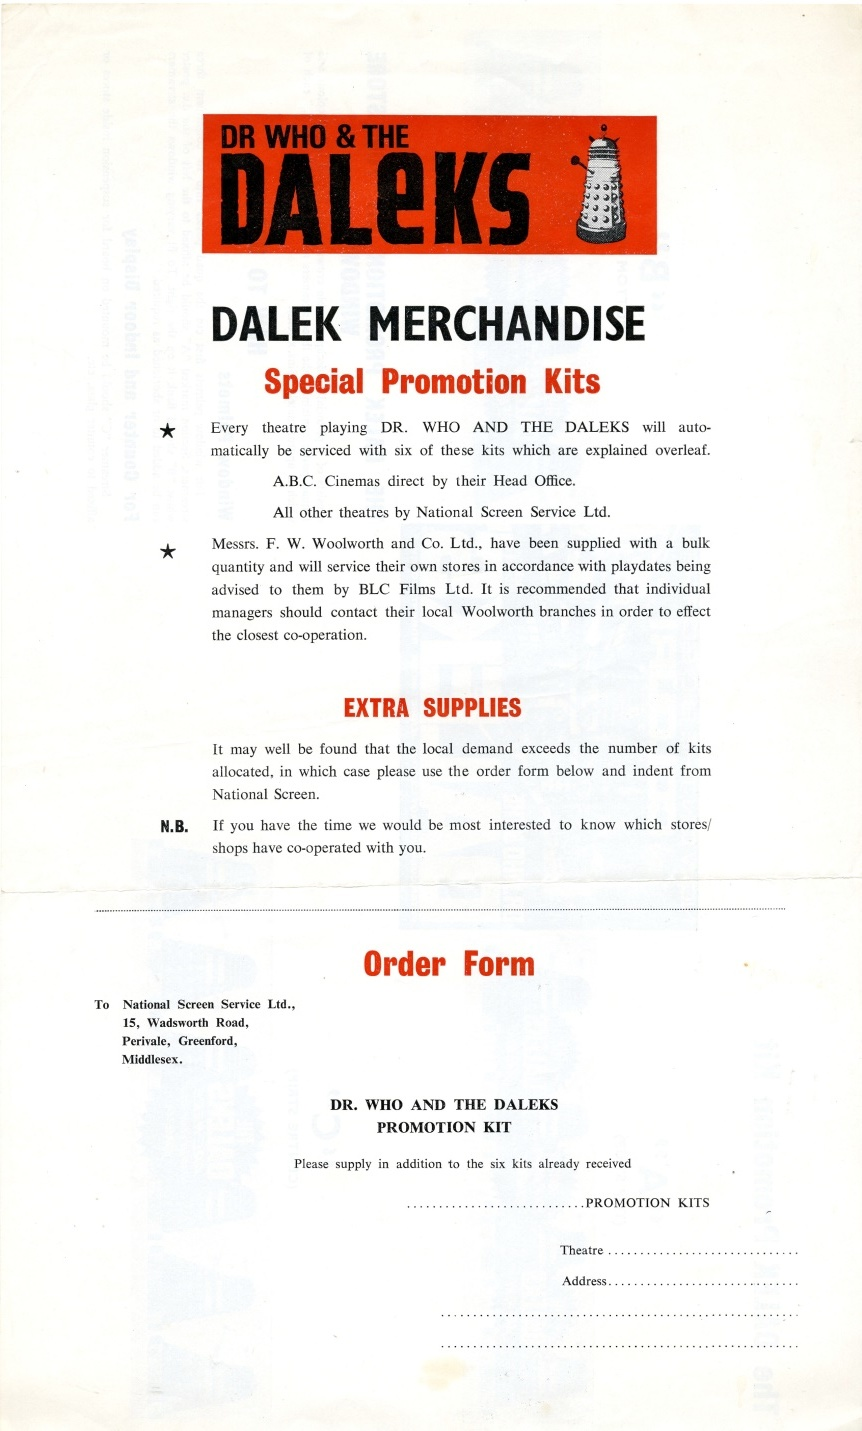 National Screen Service Dalek merchandise promotion kit flier (front)